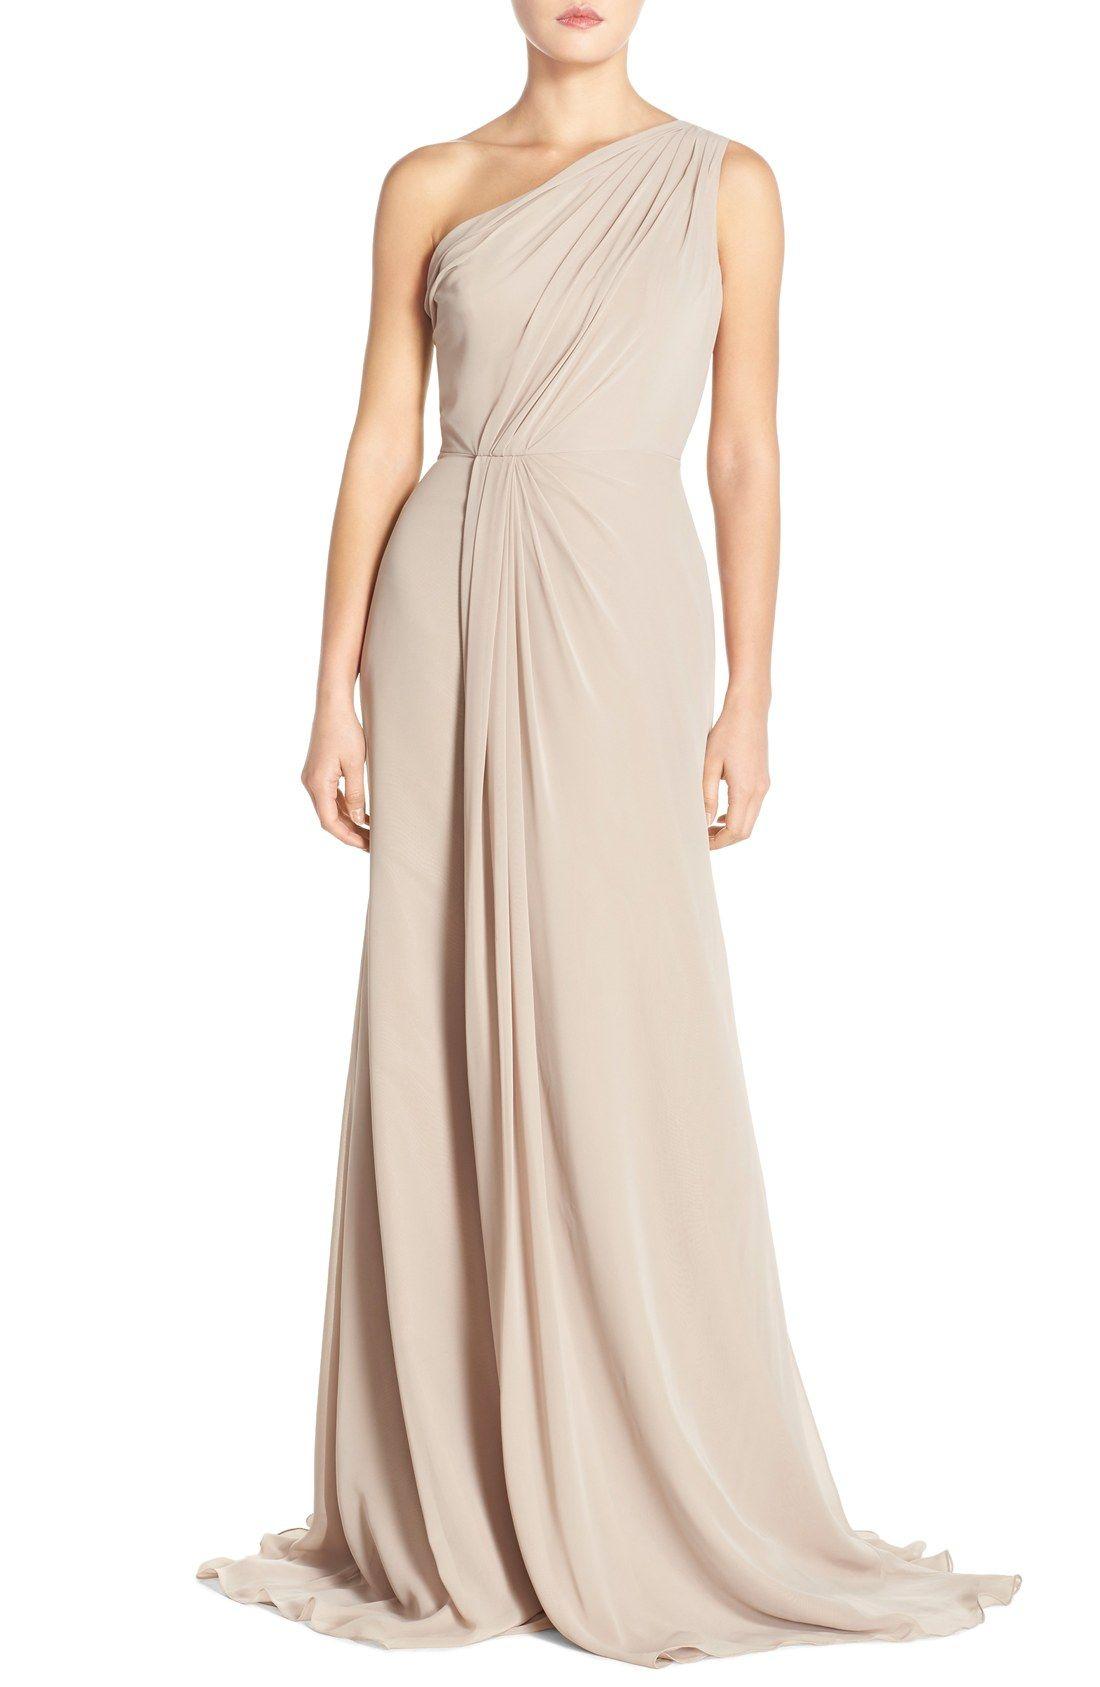 Mismatched neutral bridesmaid dresses bridesmaid dresses